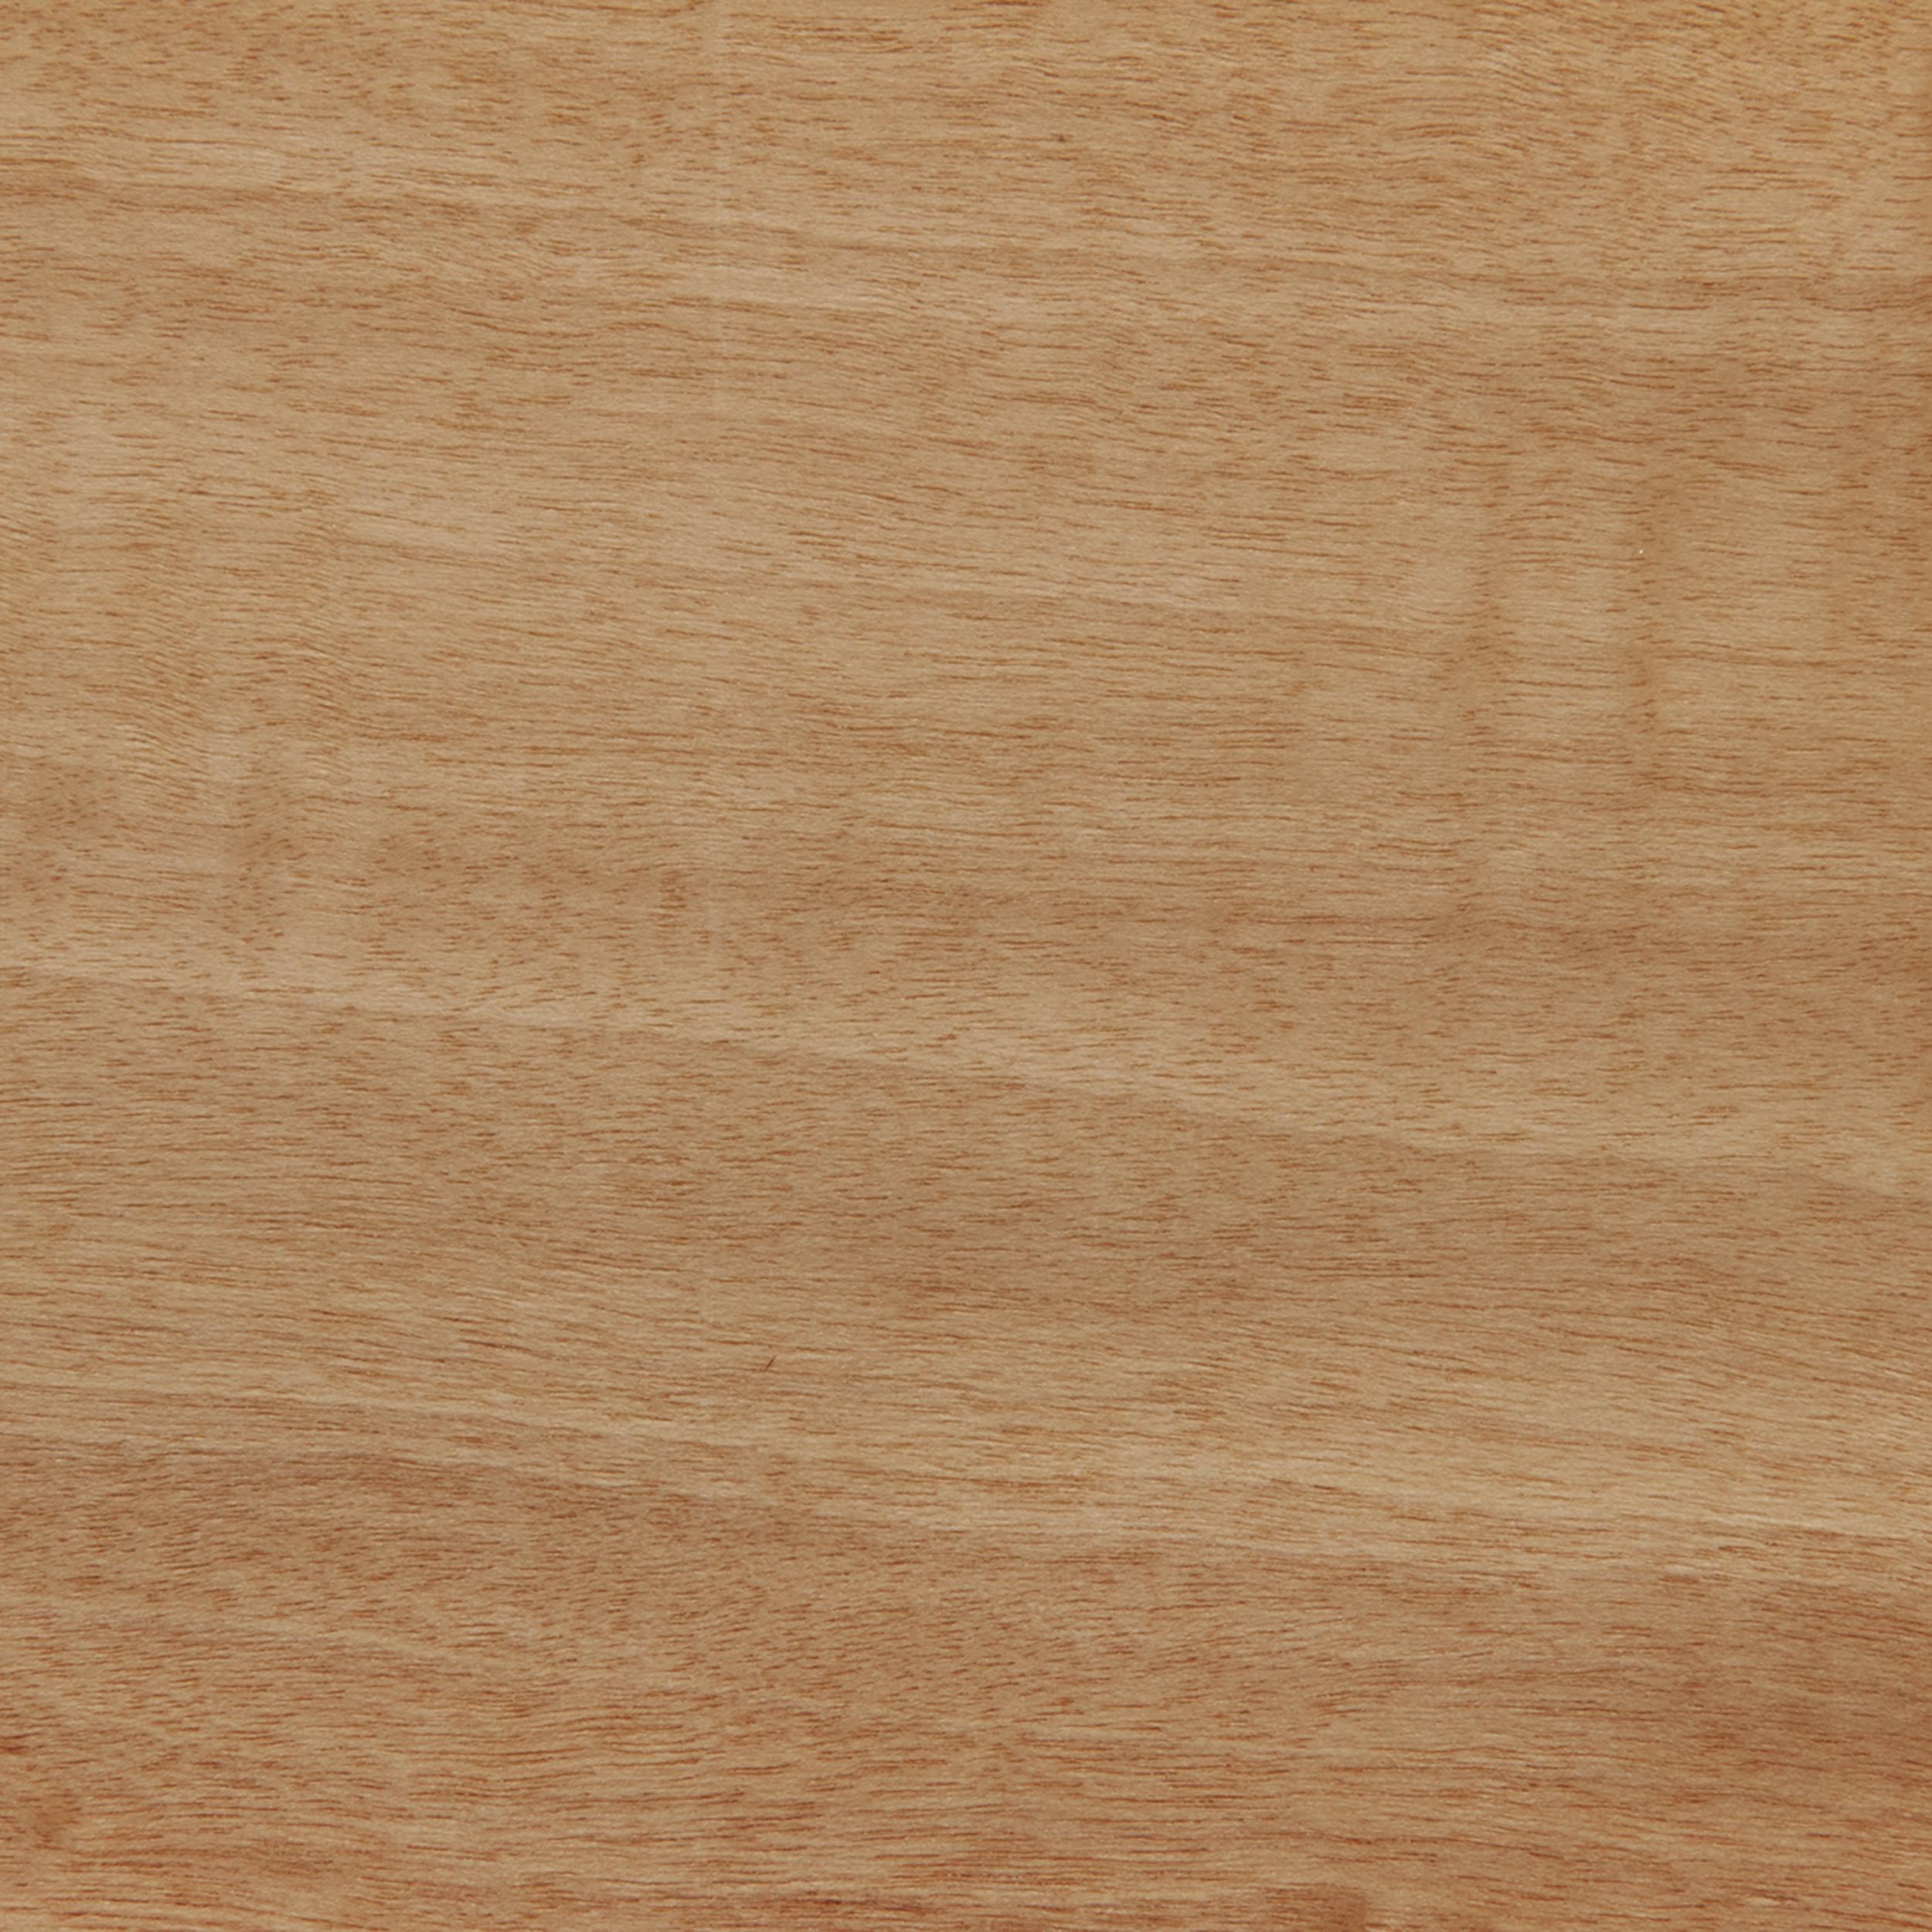 Anigre Veneer Sheet Quarter Cut Medium Figure 4' x 8' 2-Ply Wood on Wood